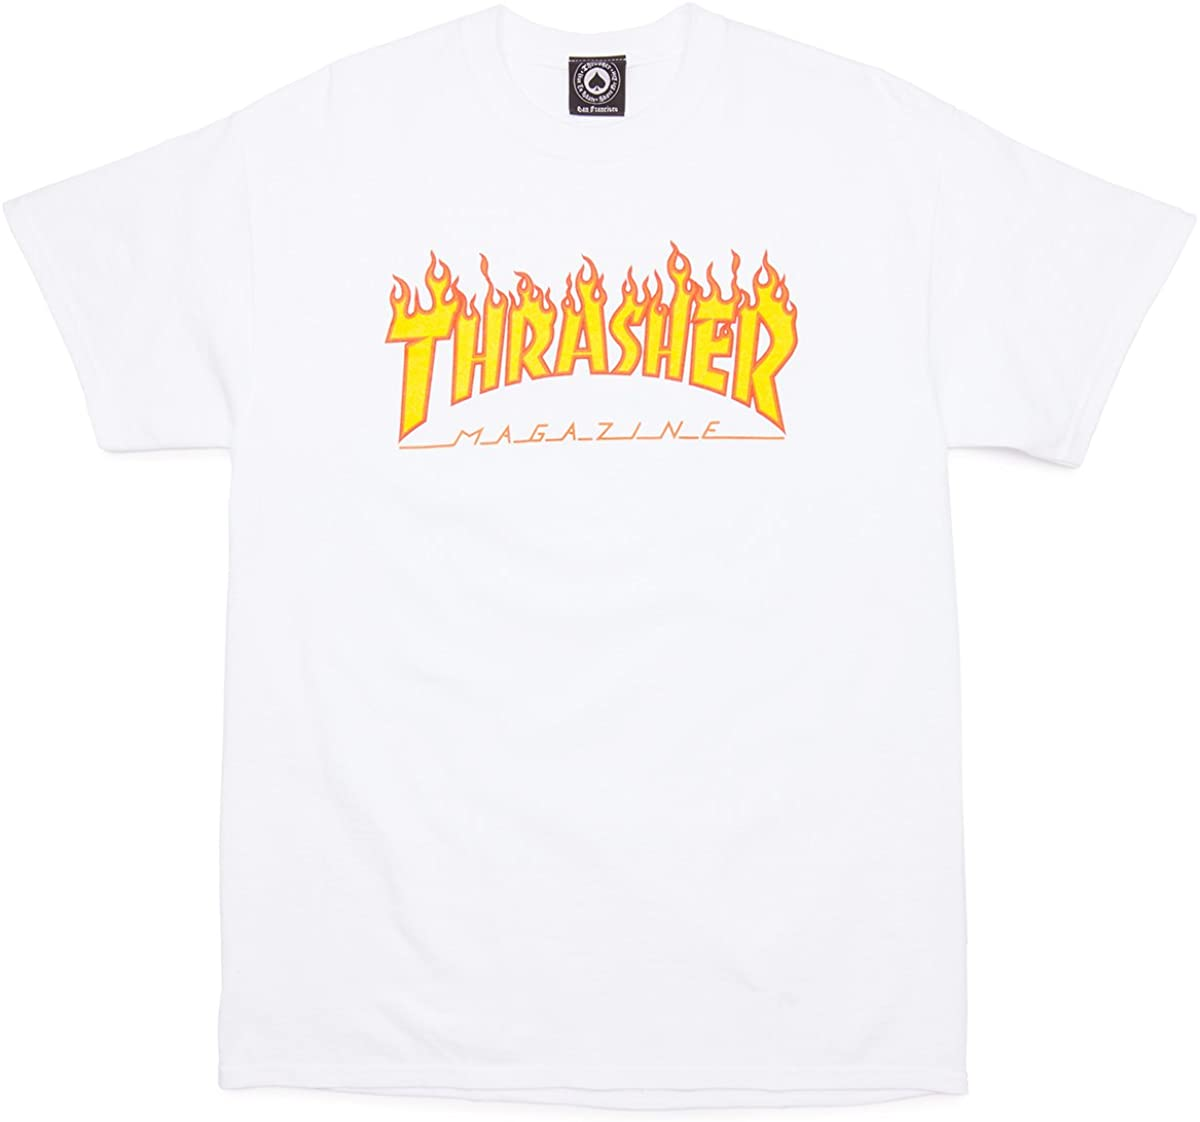 Thrasher Flame White Tee